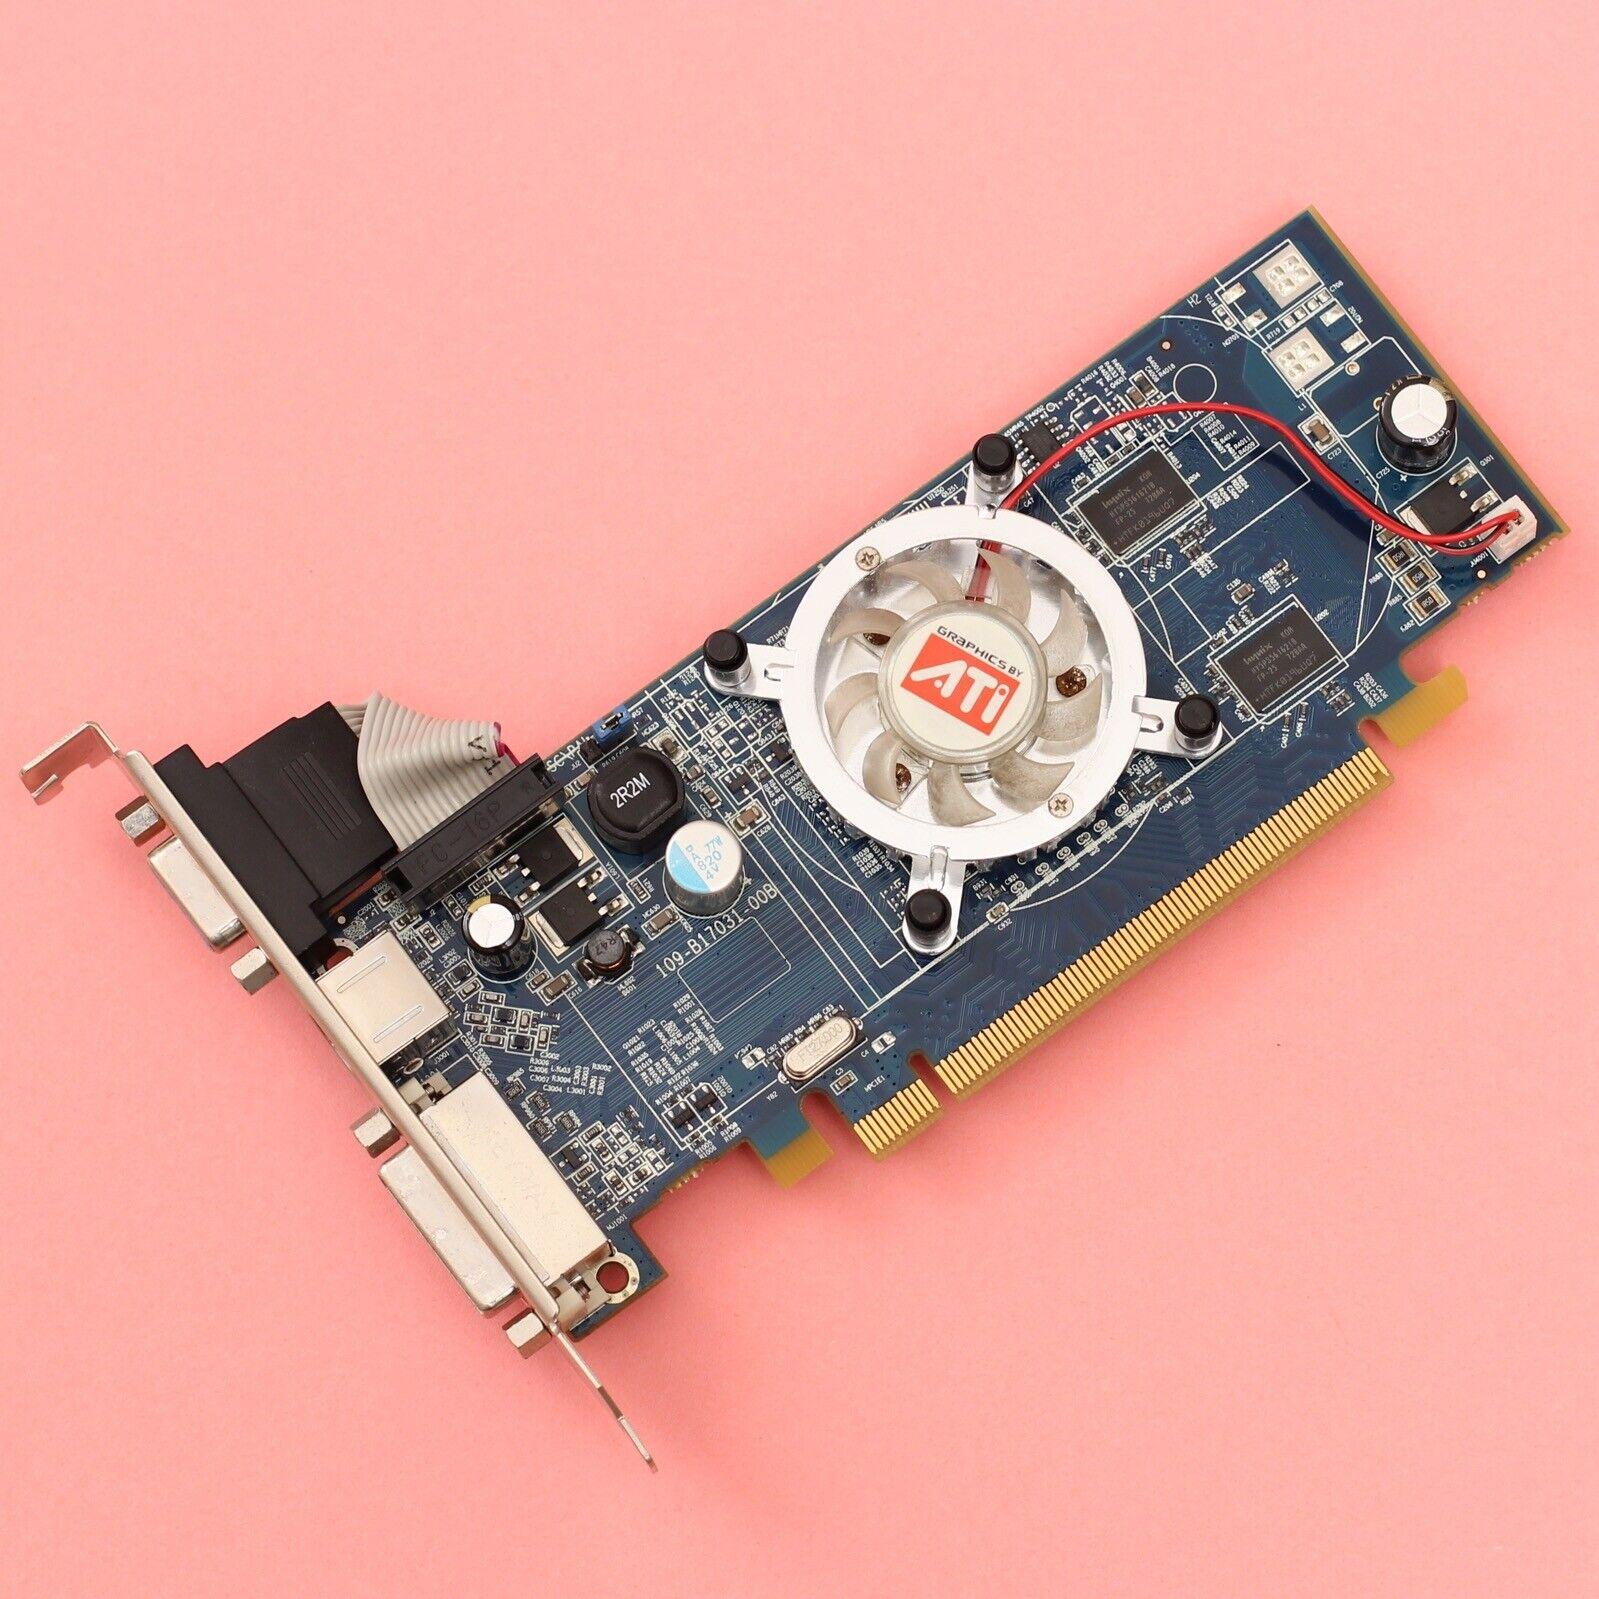 ATI Radeon HD2400 PRO 128MB DDR2 PCI-E Video Card DVI/VGA/S-Video *WORKING*